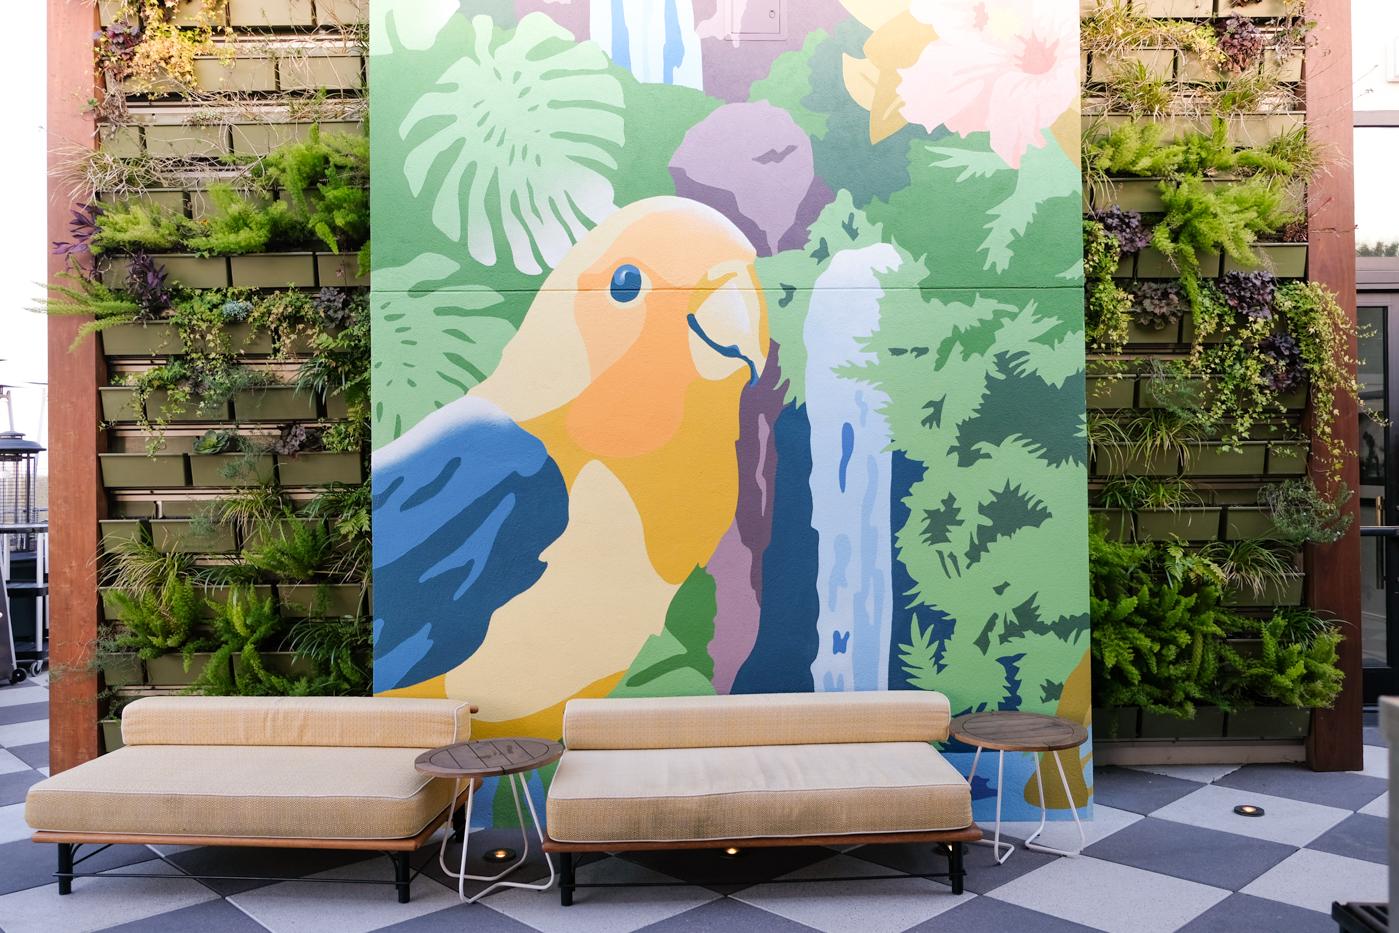 peregrin-restaurant-wall-mural.jpg